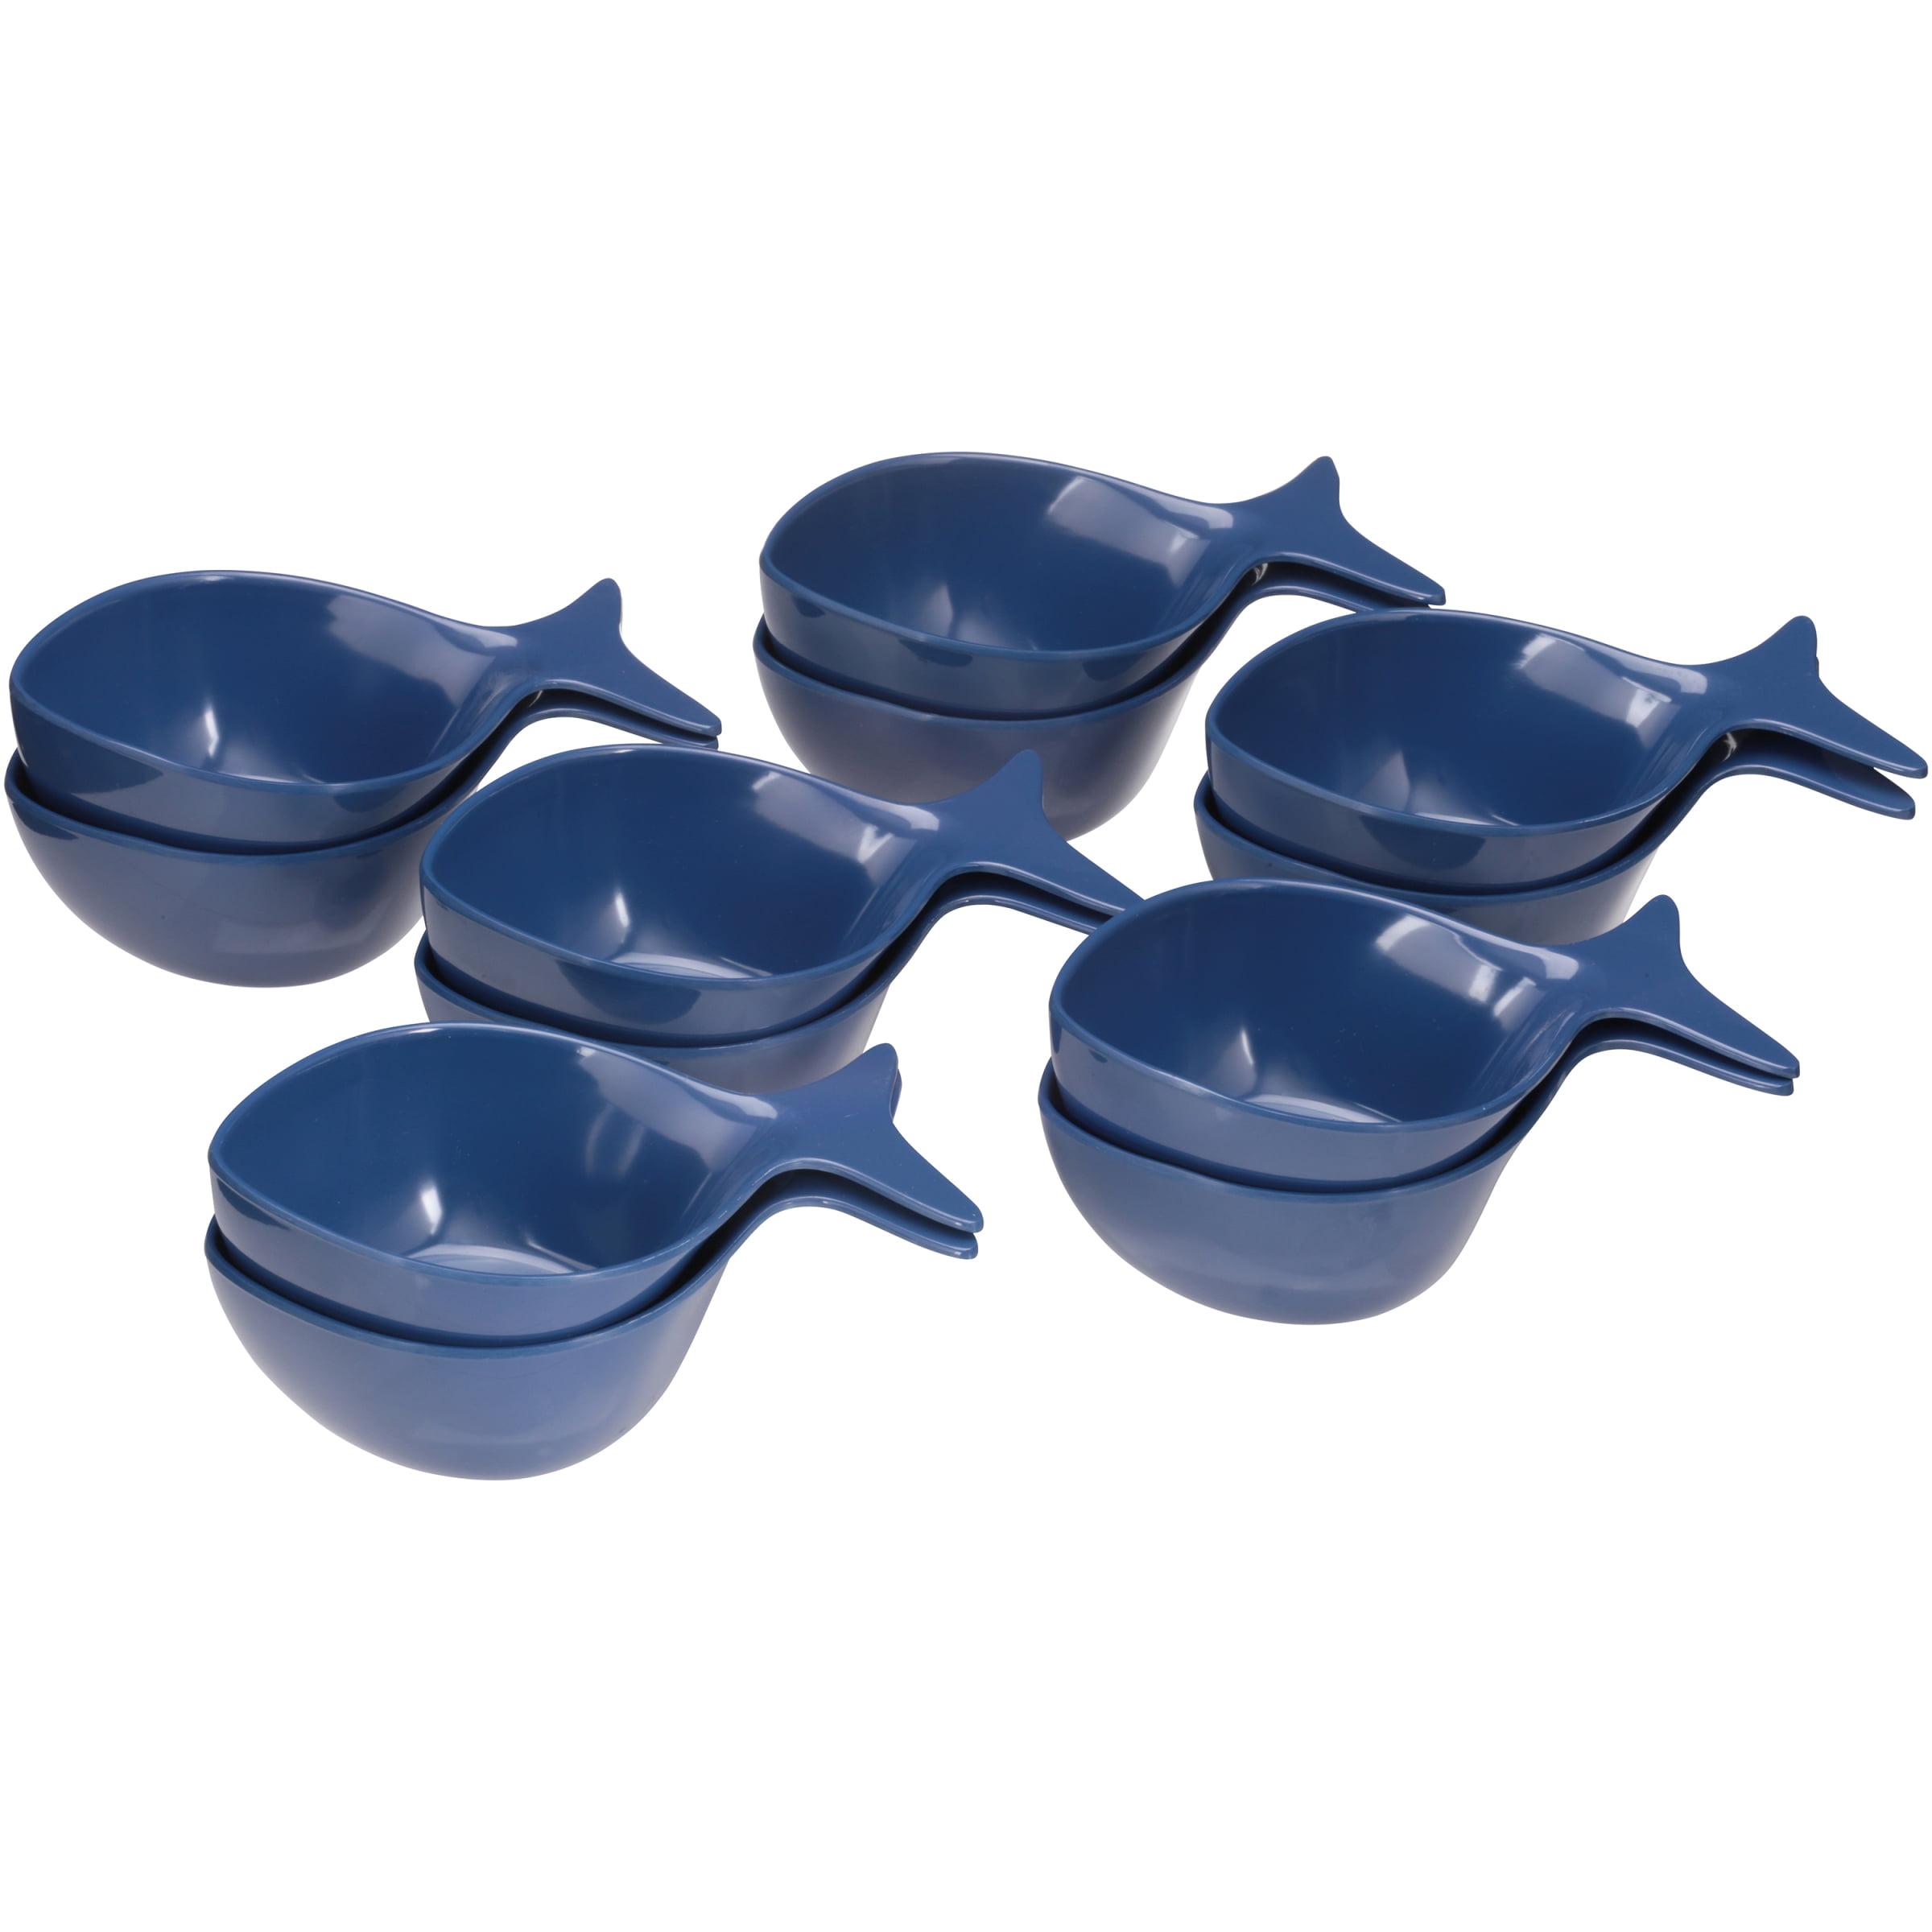 Mainstays Summer Entertaining Melamine Figural Fish Bowls, Dark Blue, 12 Pack